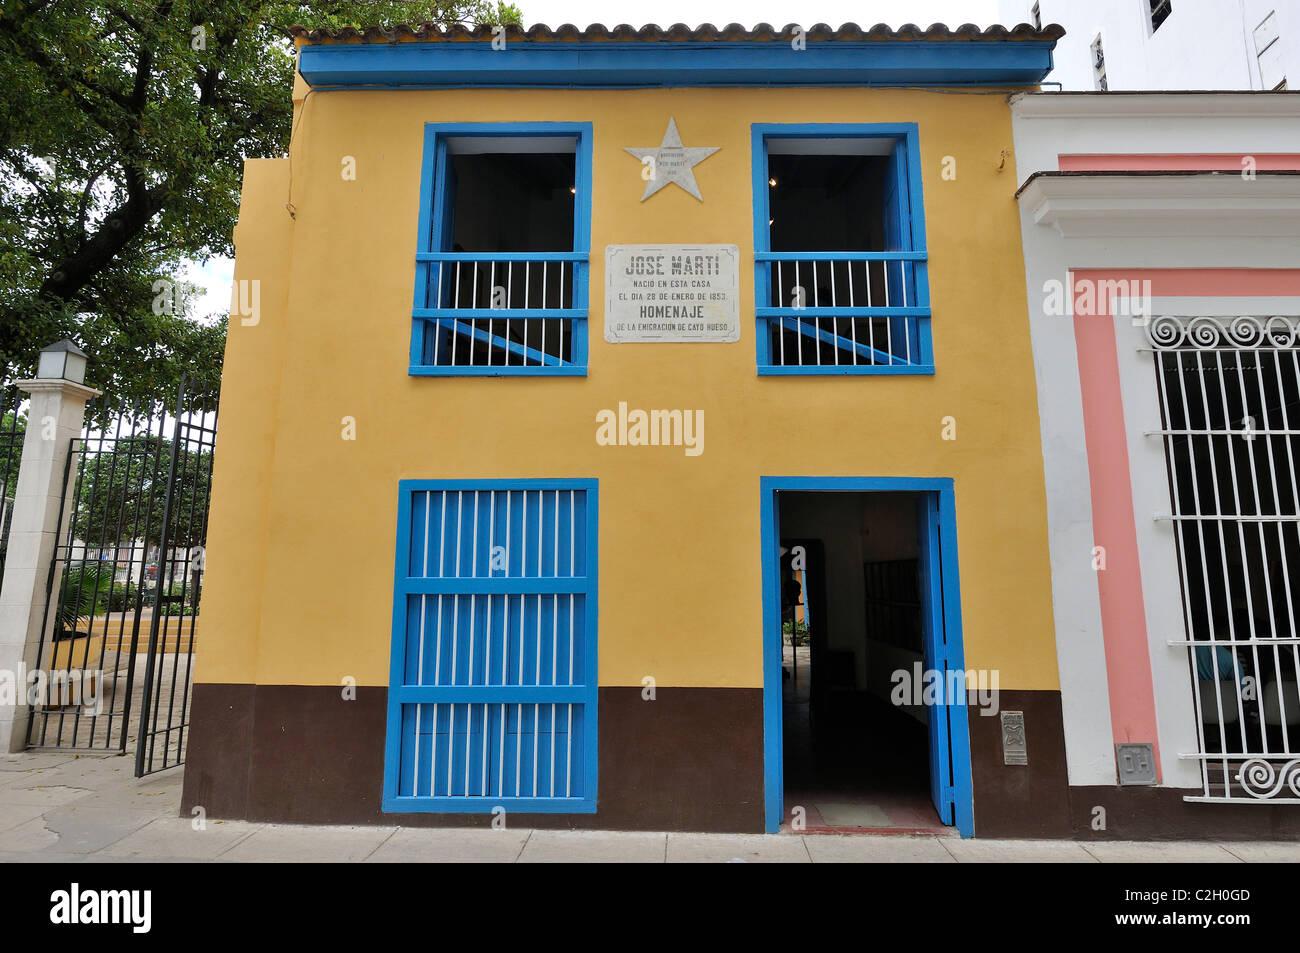 Havana. Cuba. Casa Natal de José Marti / Birthplace of José Marti, Habana Vieja / Old Havana. - Stock Image